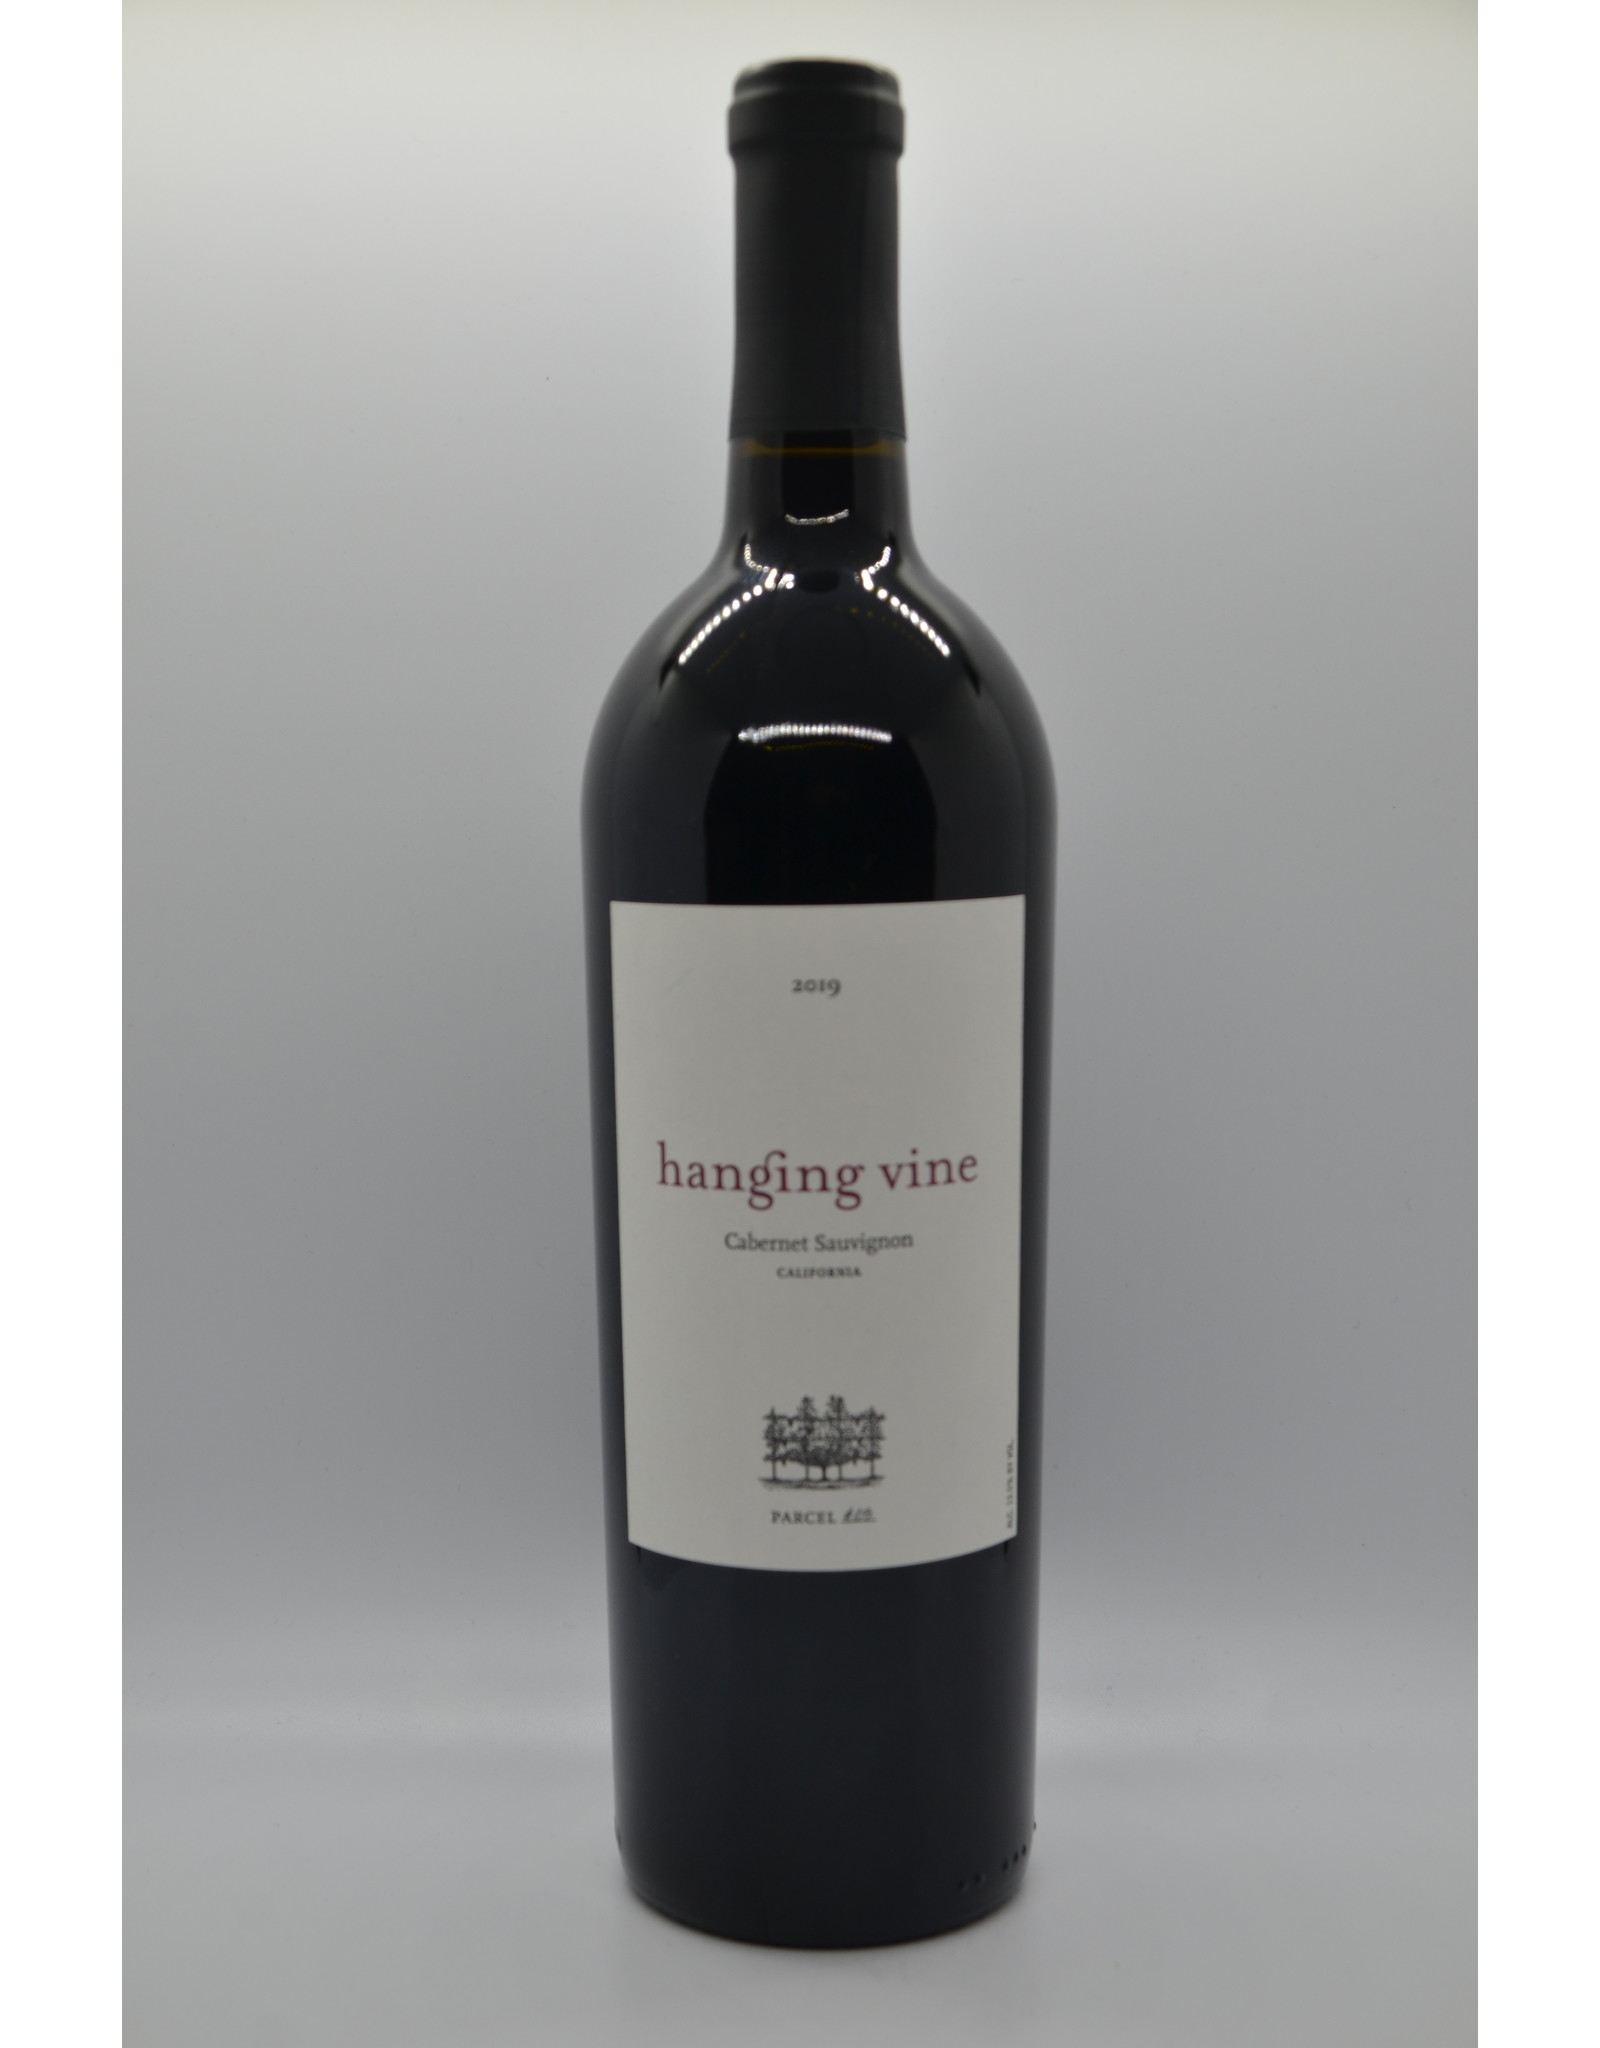 USA Hanging Vine Cabernet Sauvignon